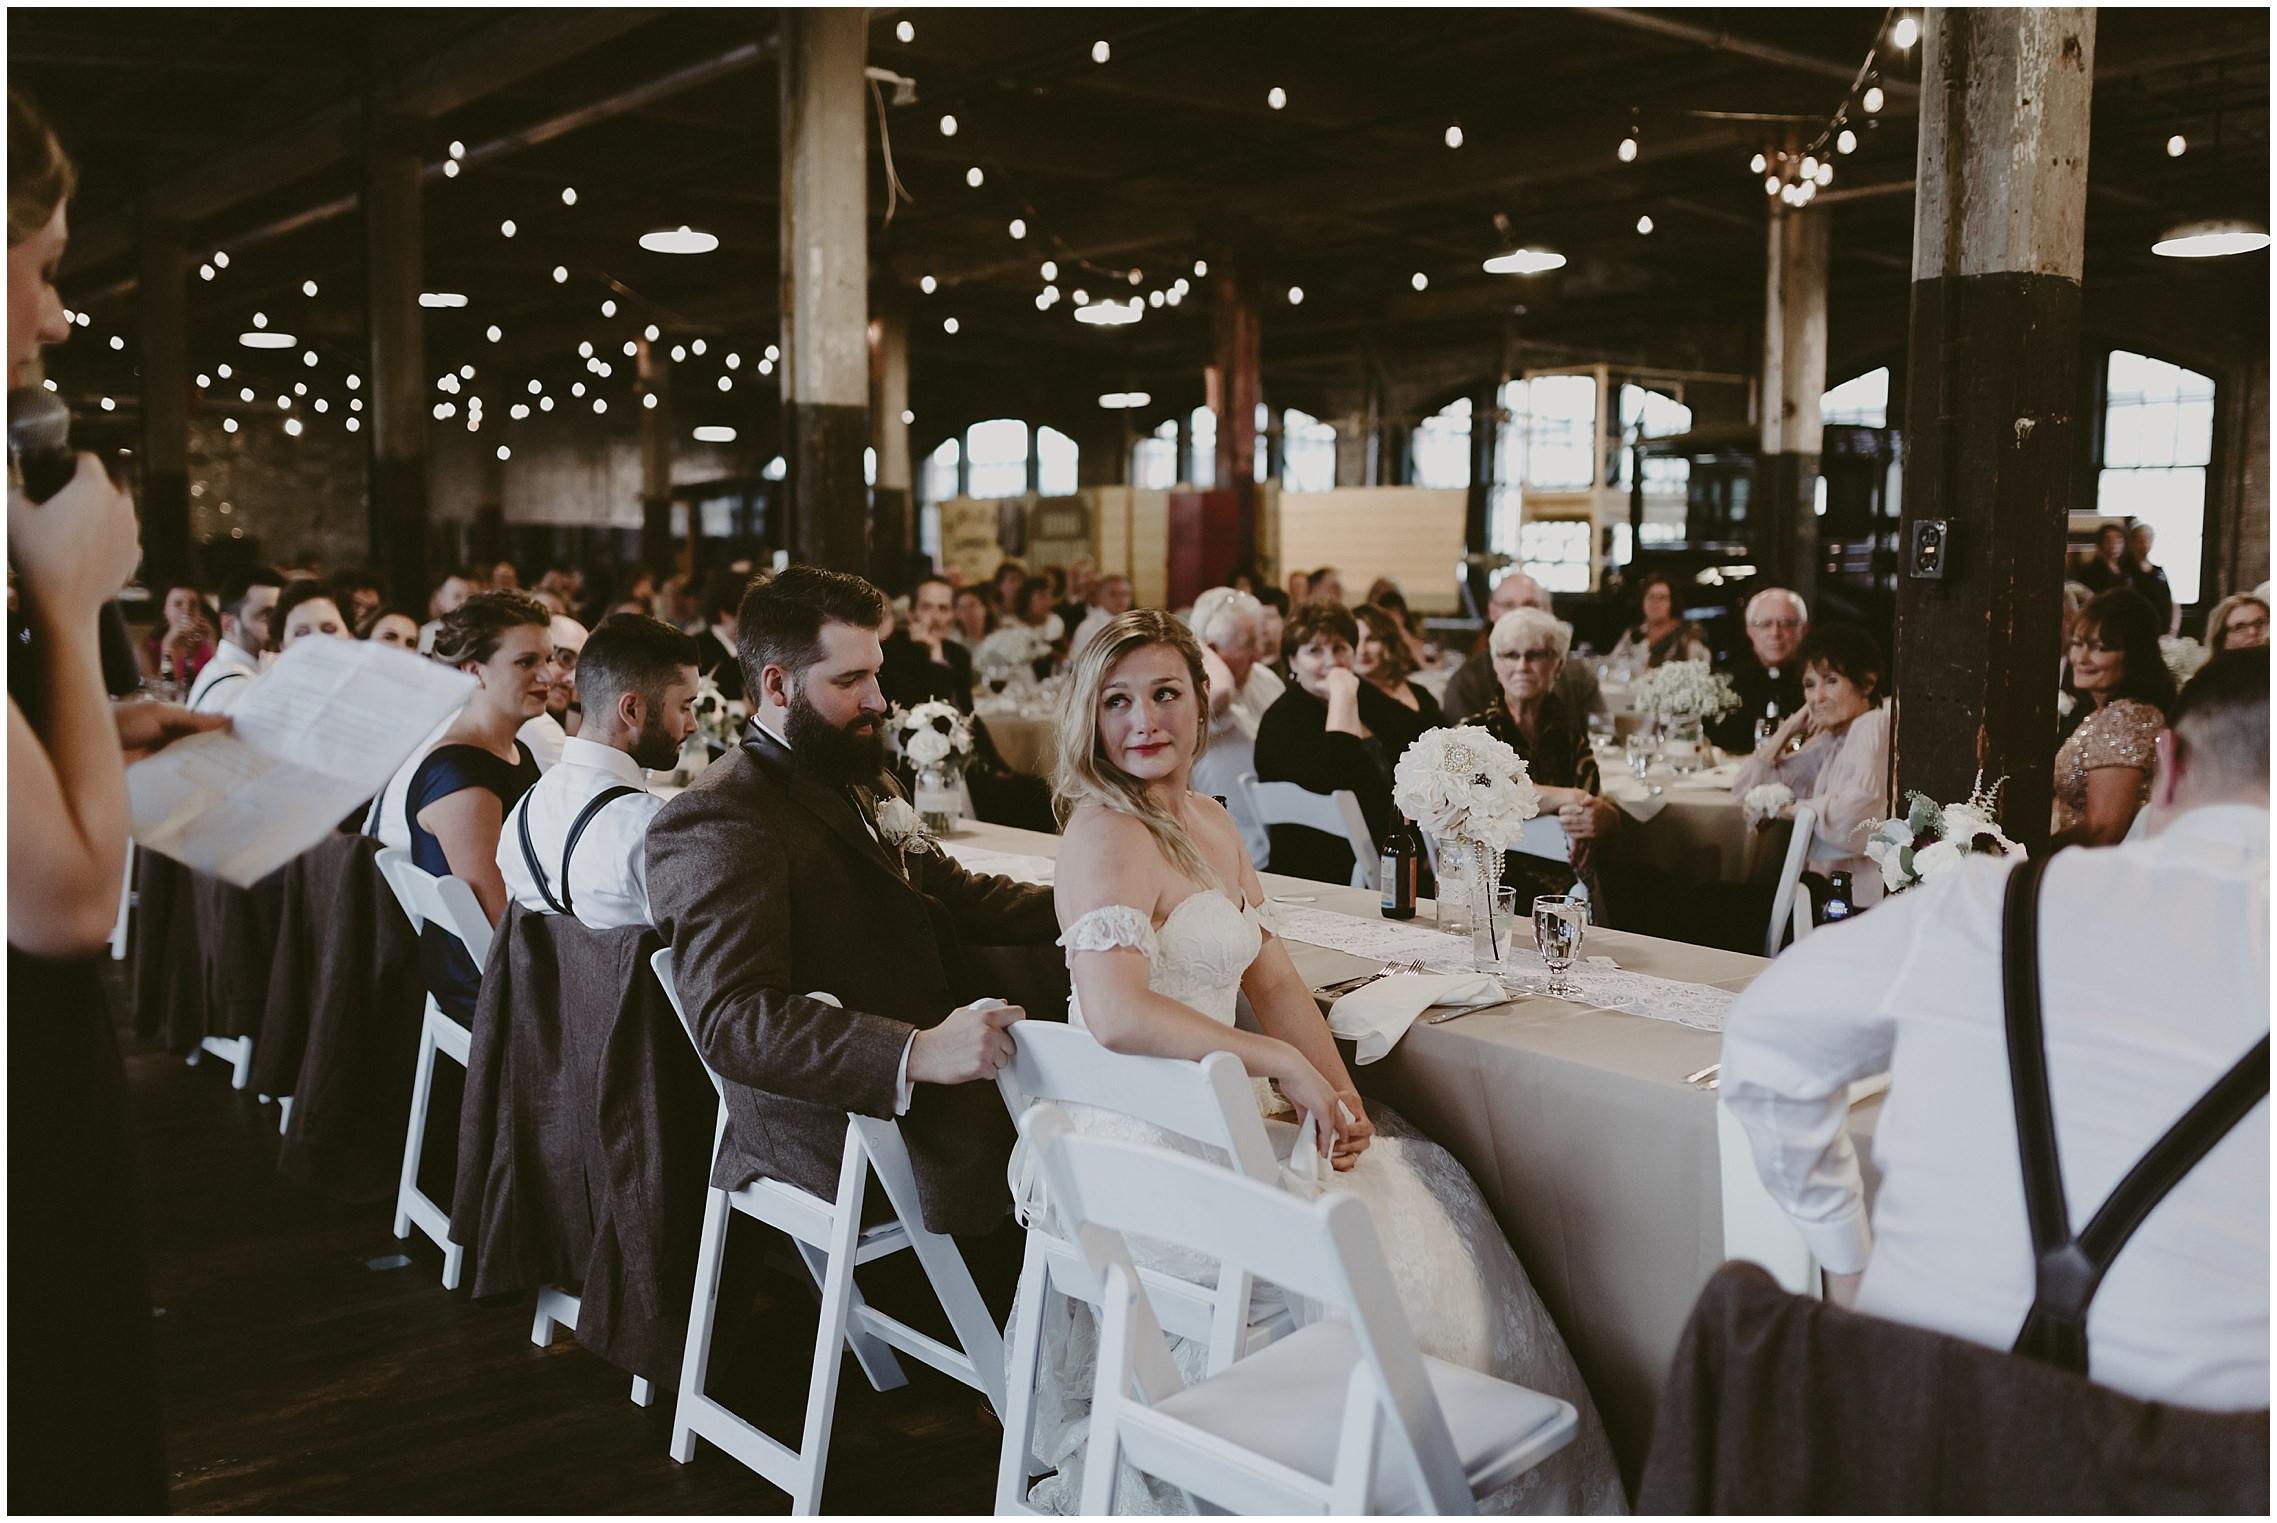 brick_and_mortar_colorado_wedding_photographer_0257.jpg